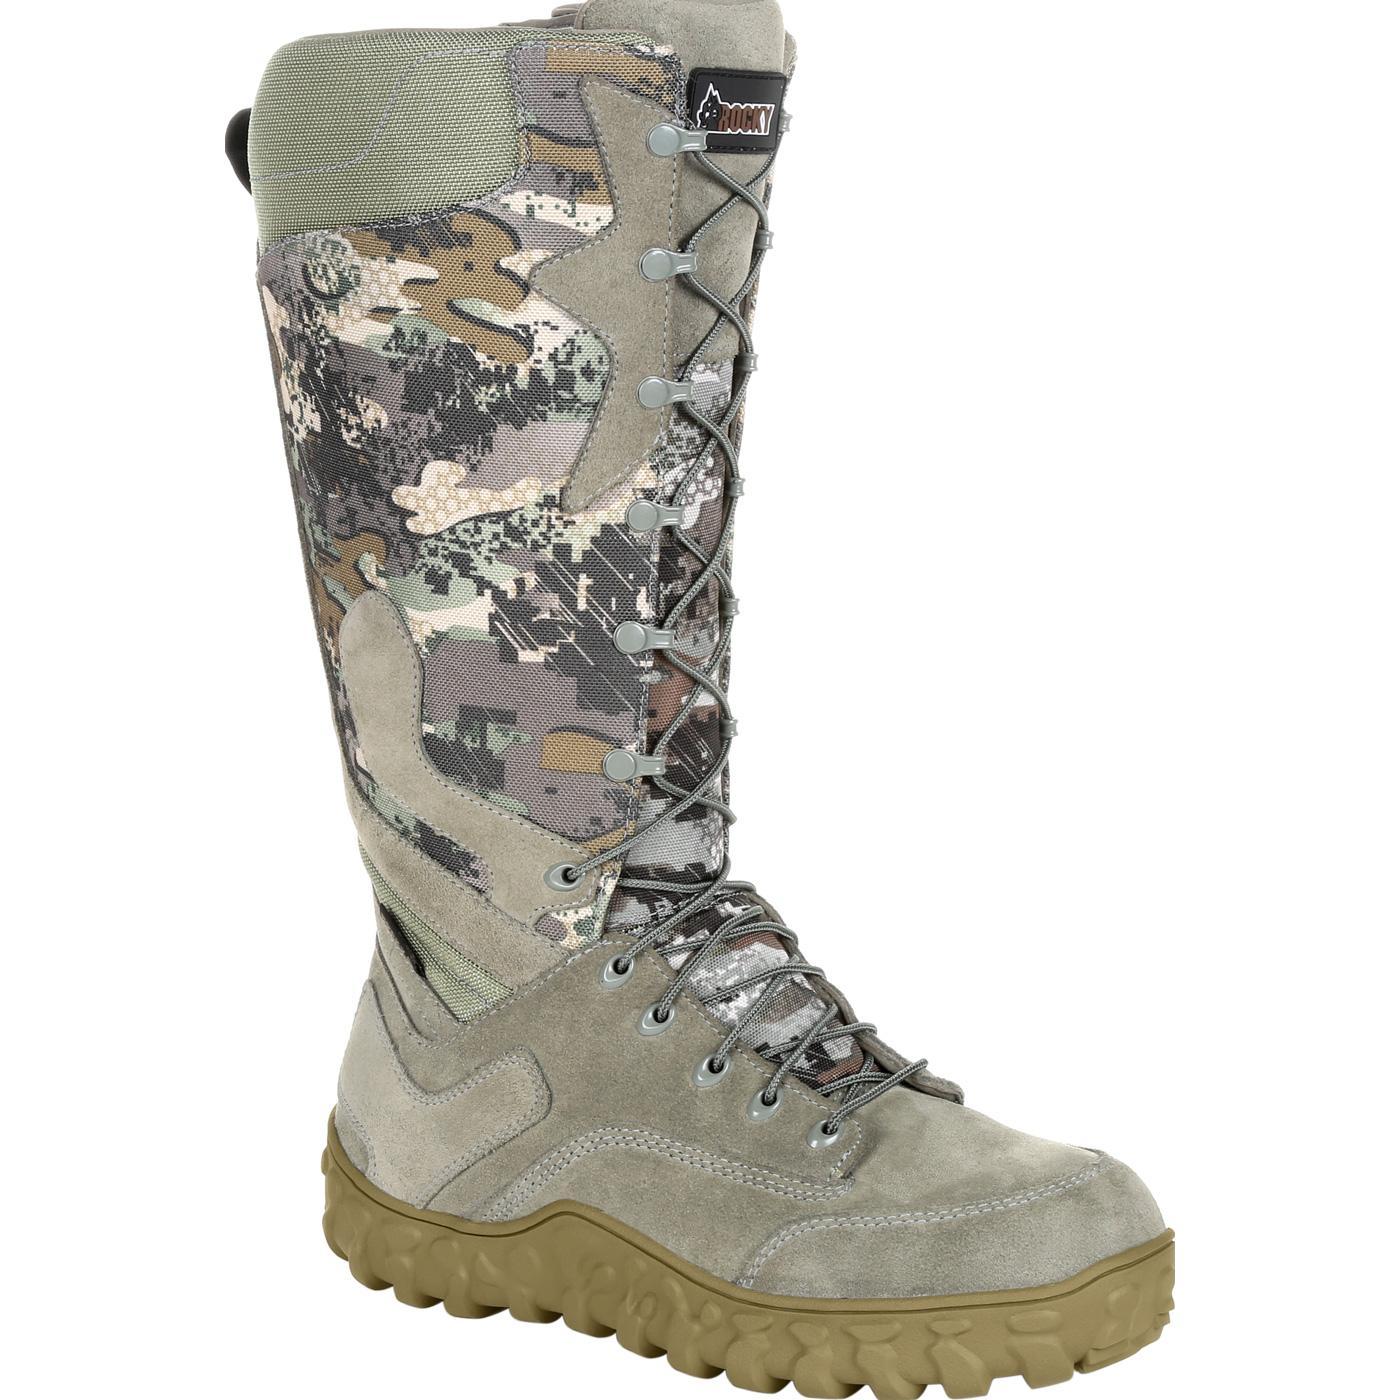 Rocky 174 S2v Tactical Snake Boot Rks0315ia